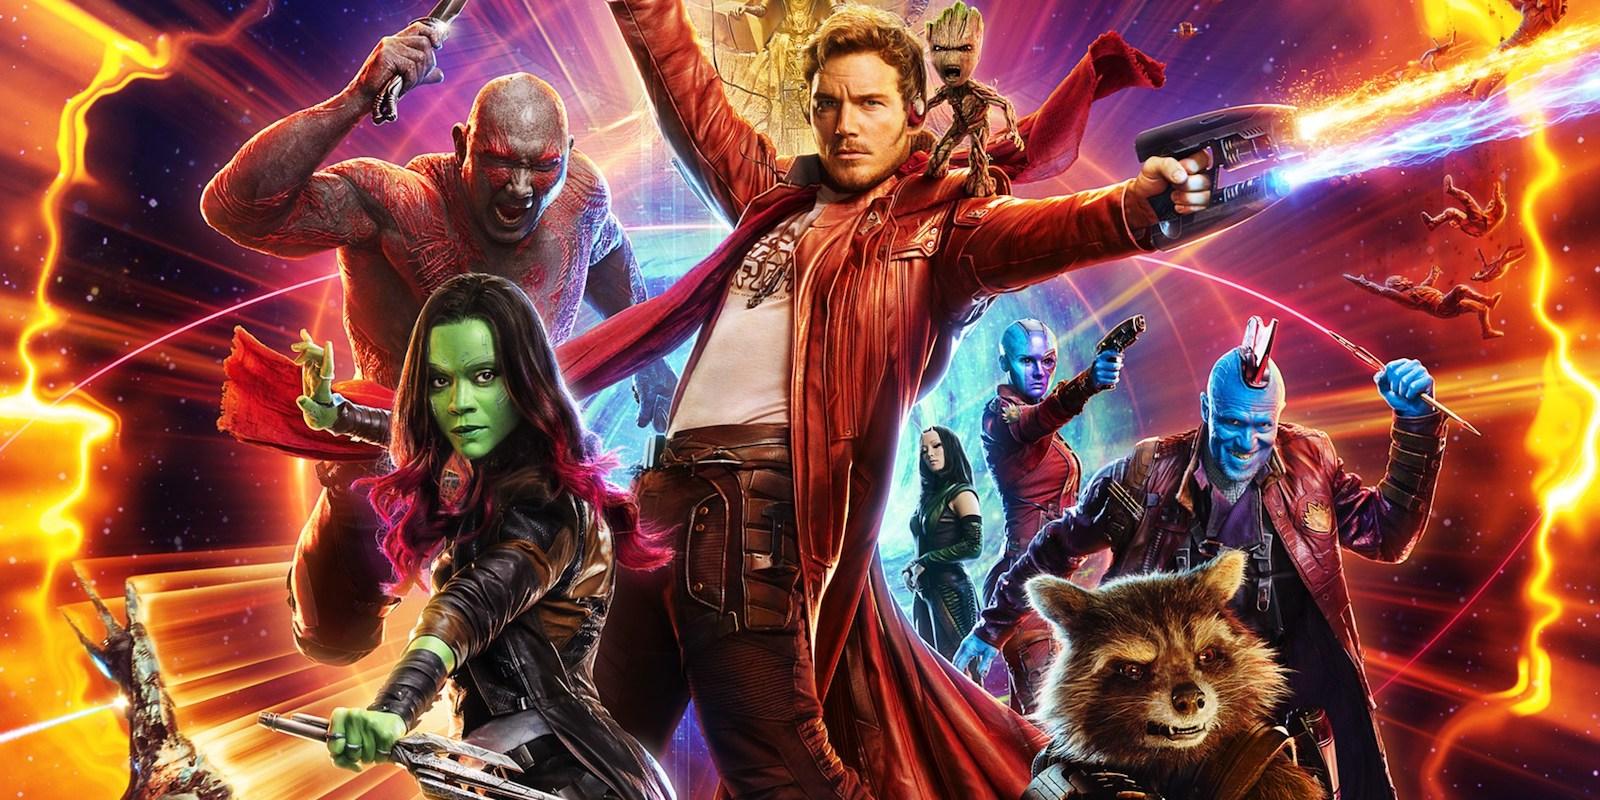 https://cinemaplanet.pt/wp-content/uploads/2017/04/Guardians-of-the-Galaxy-Vol-2-wallpaper.jpg